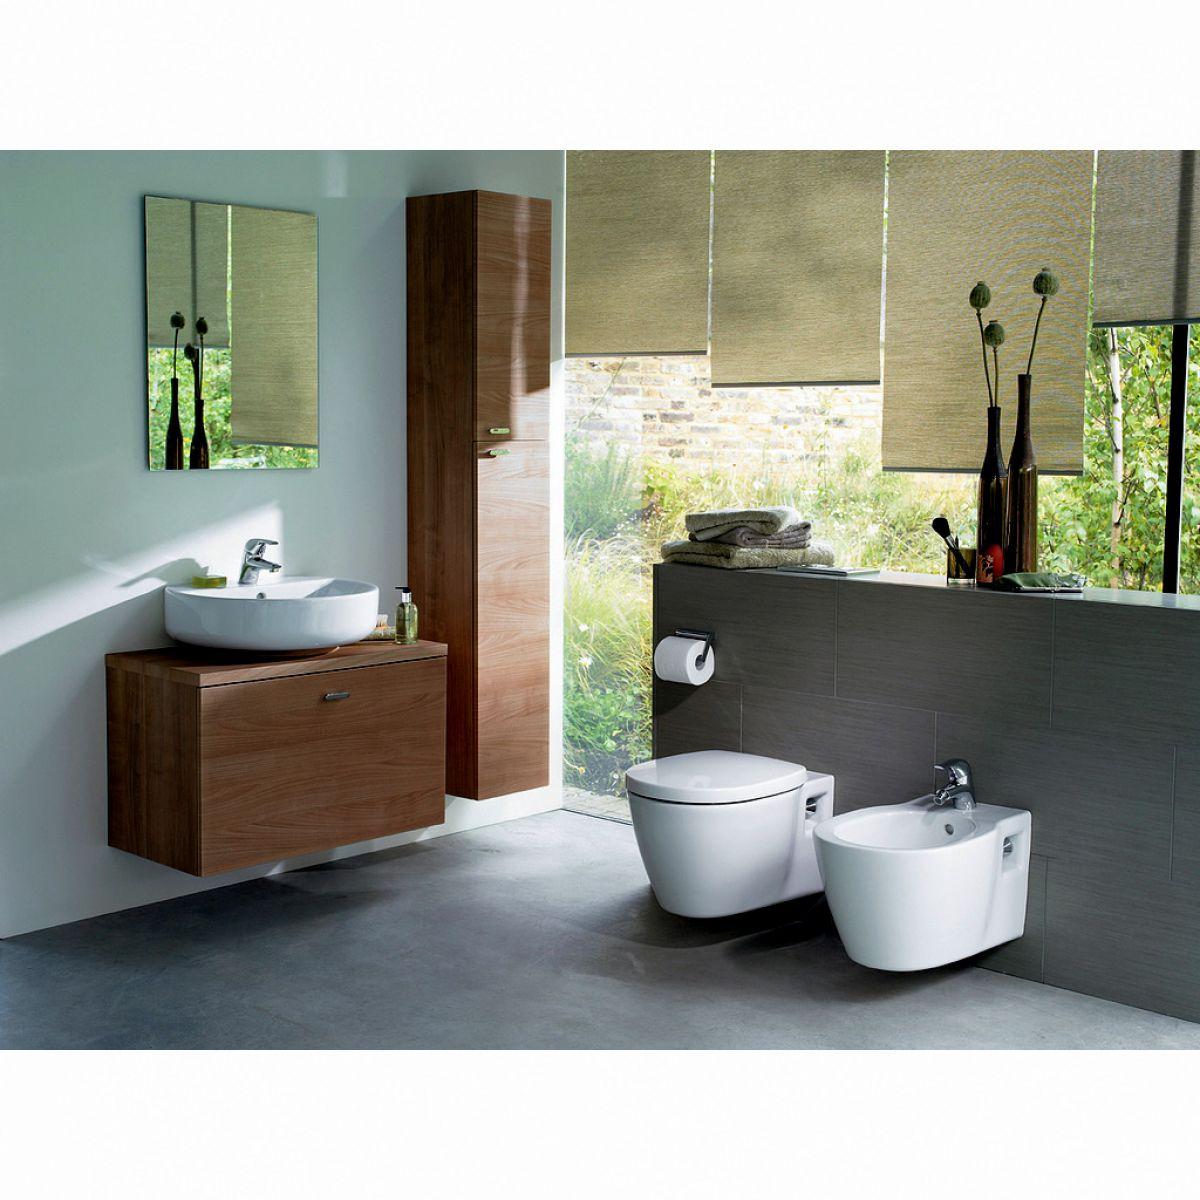 ideal standard concept wall hung pan uk bathrooms ideal standard concept wall hung pan